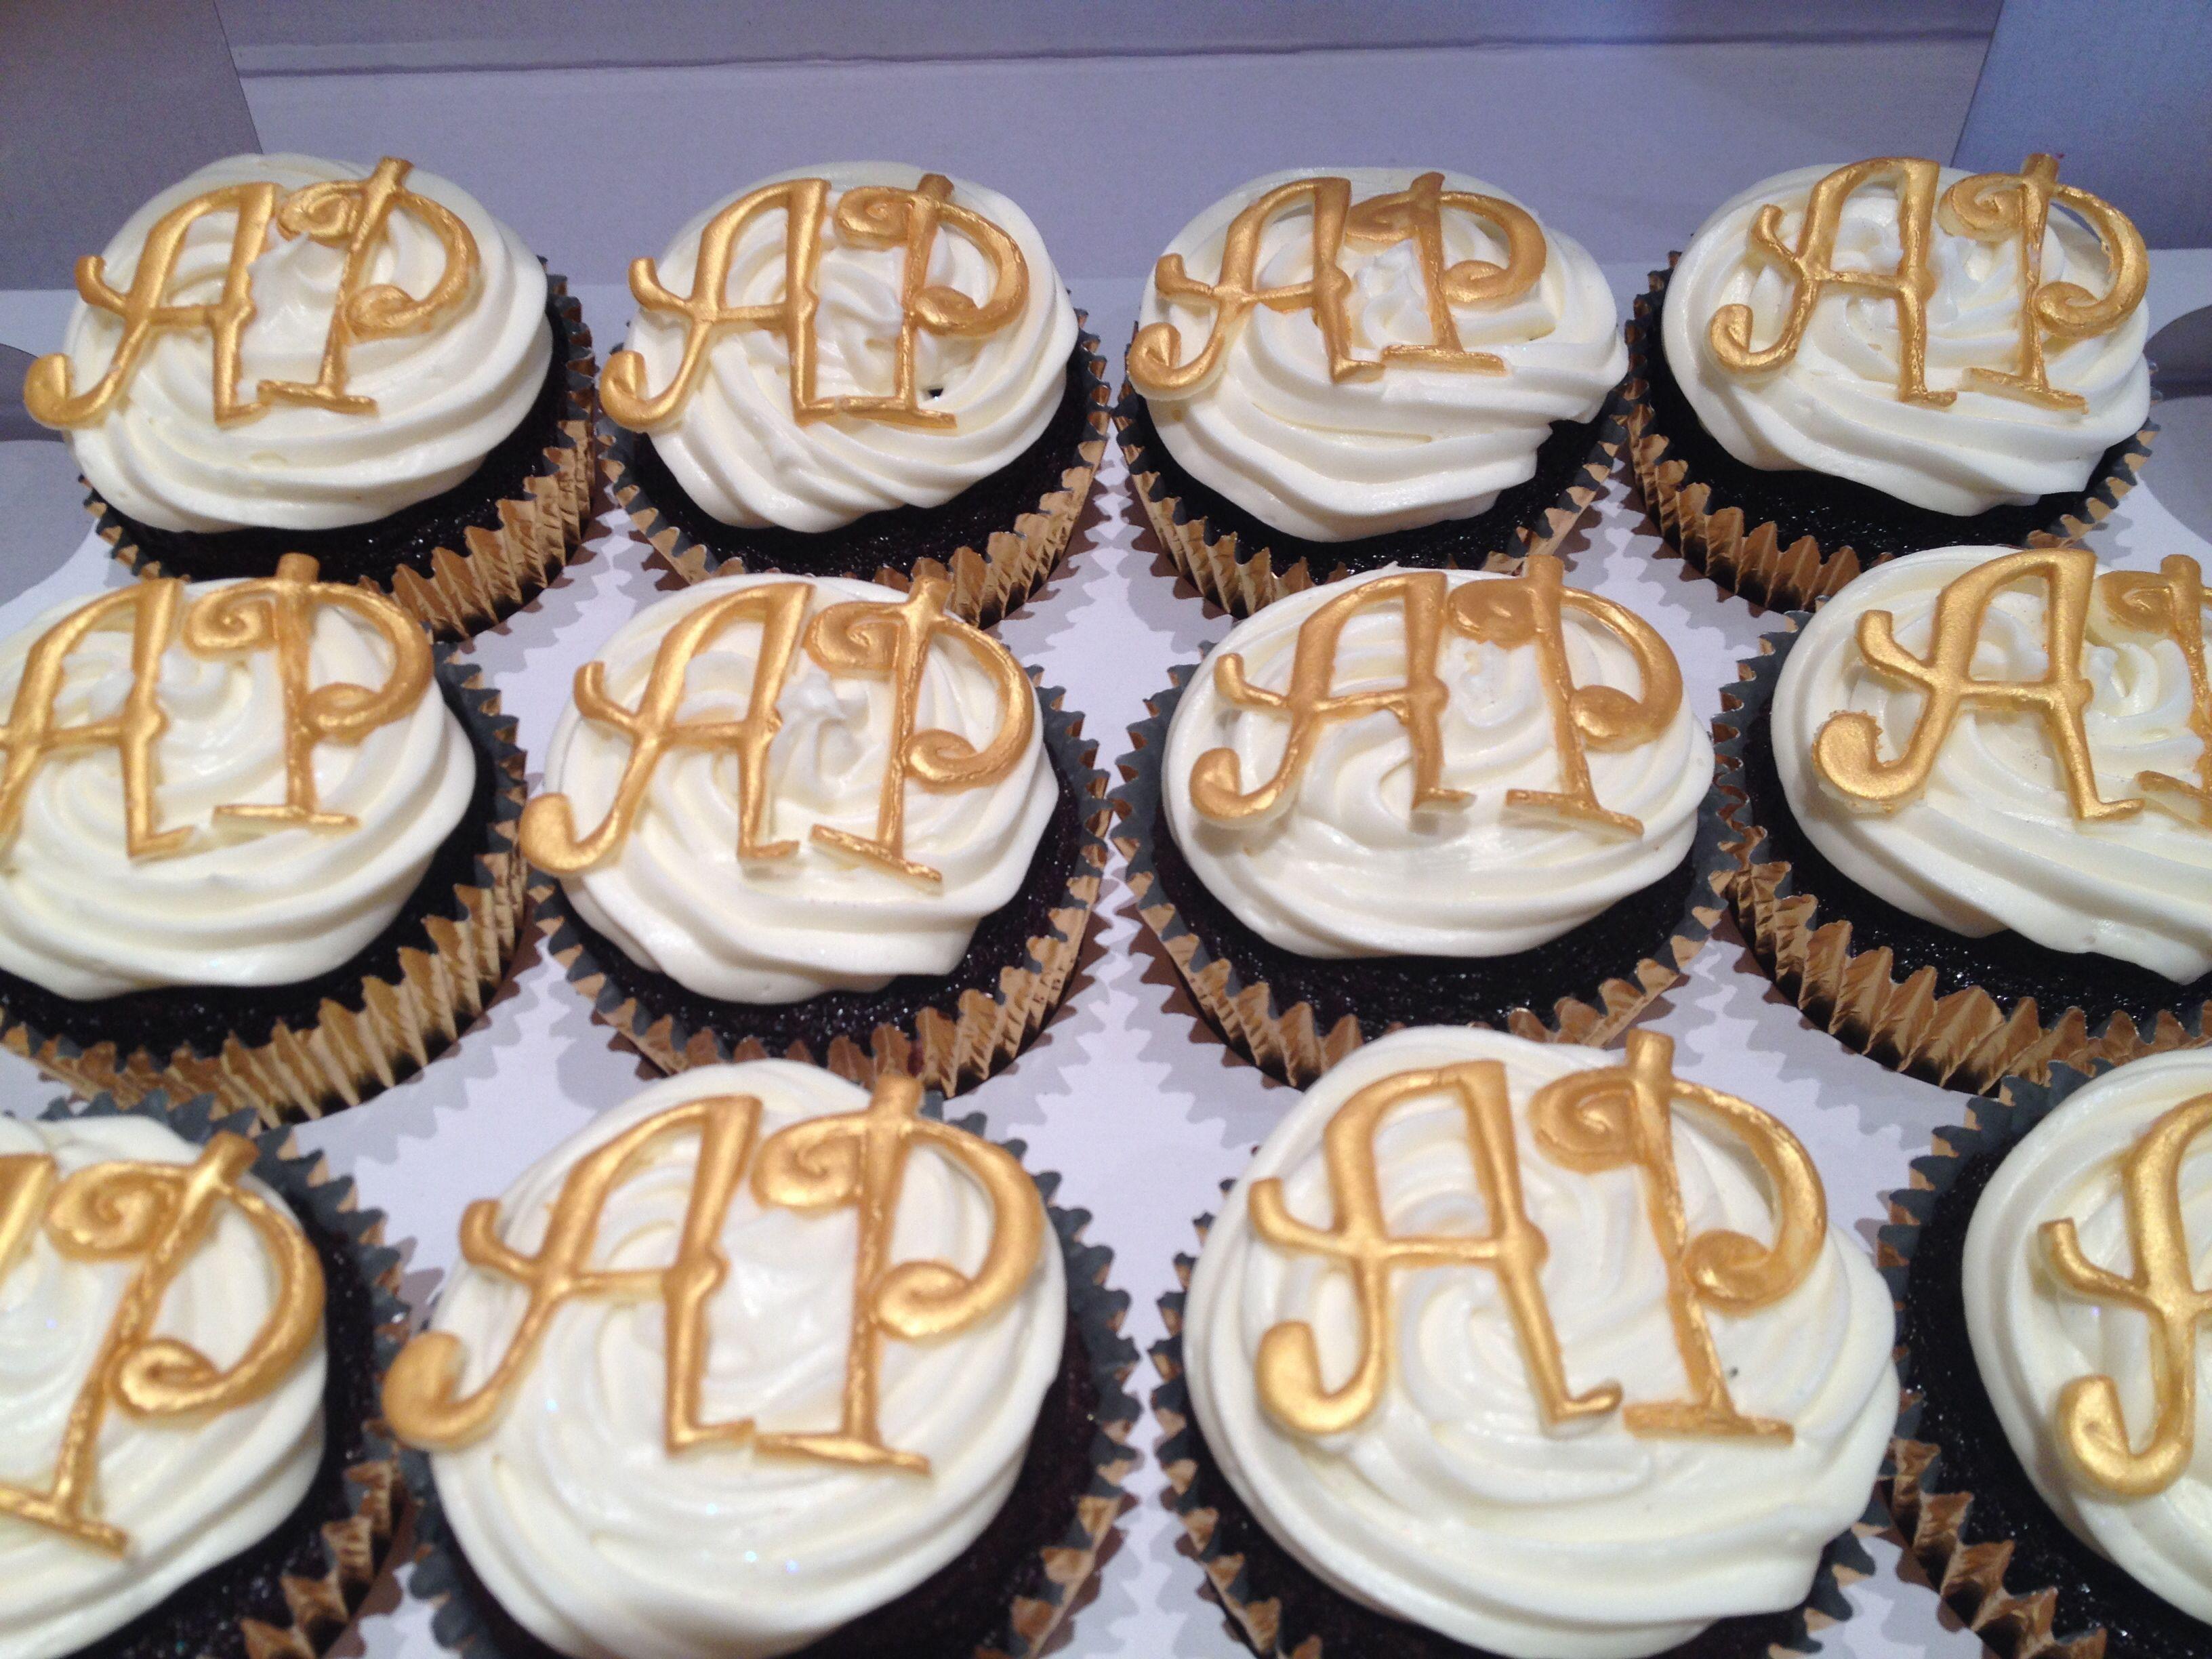 Golden Wedding Anniversary Cupcakes Anniversary cupcakes